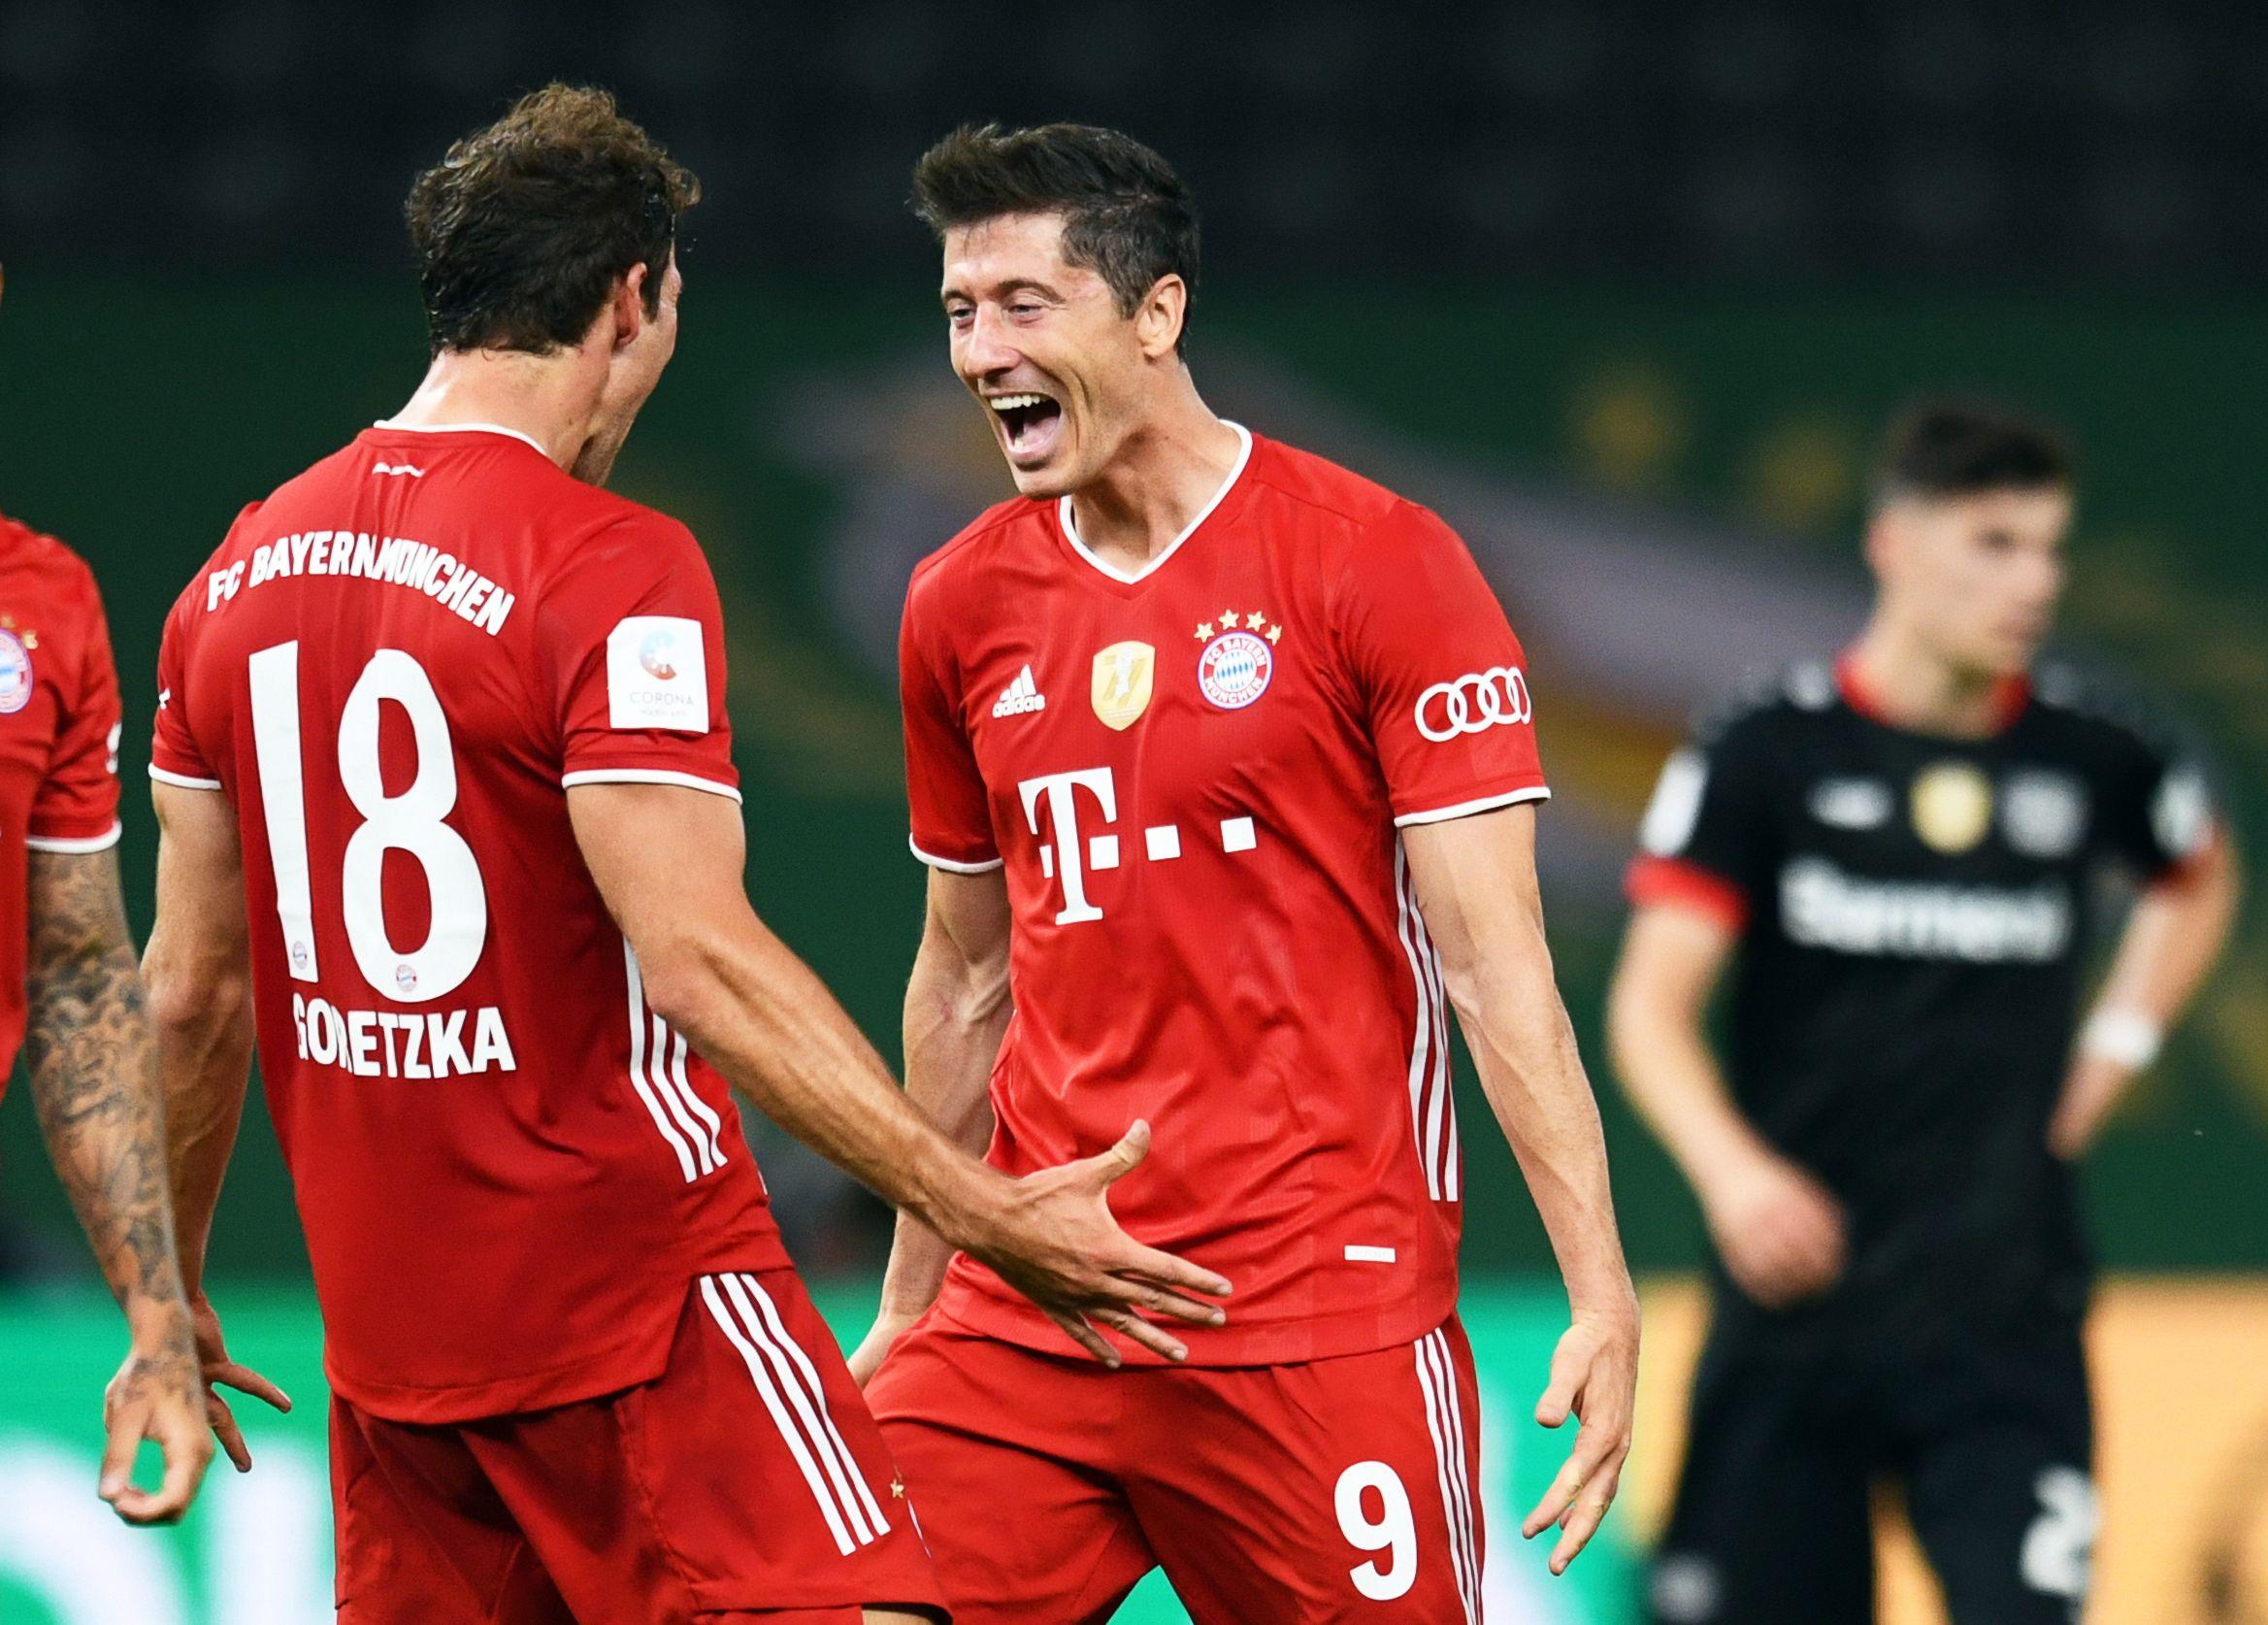 Bayern Psg Live Im Free Tv